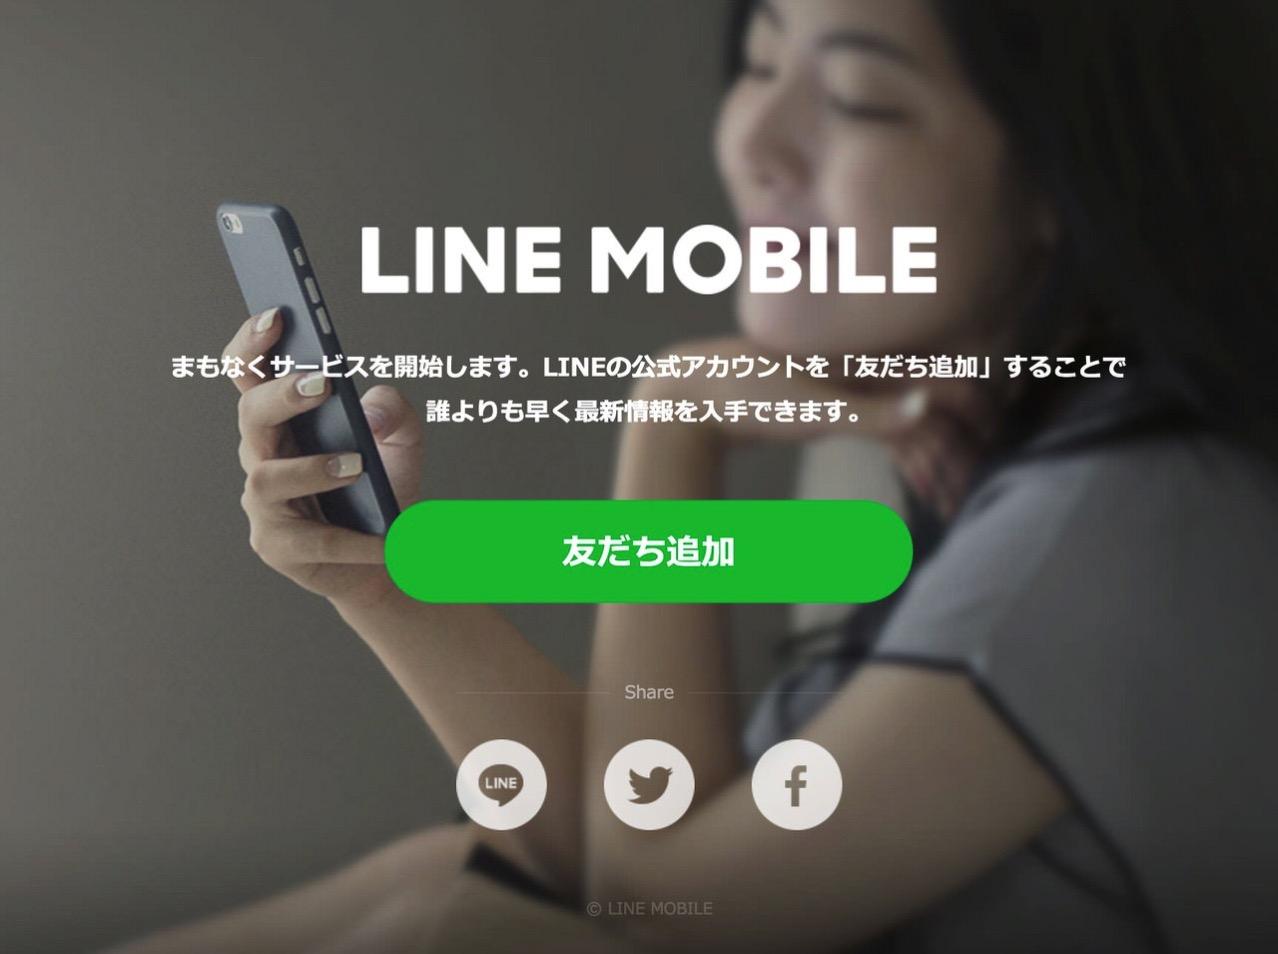 Line mobile 1126